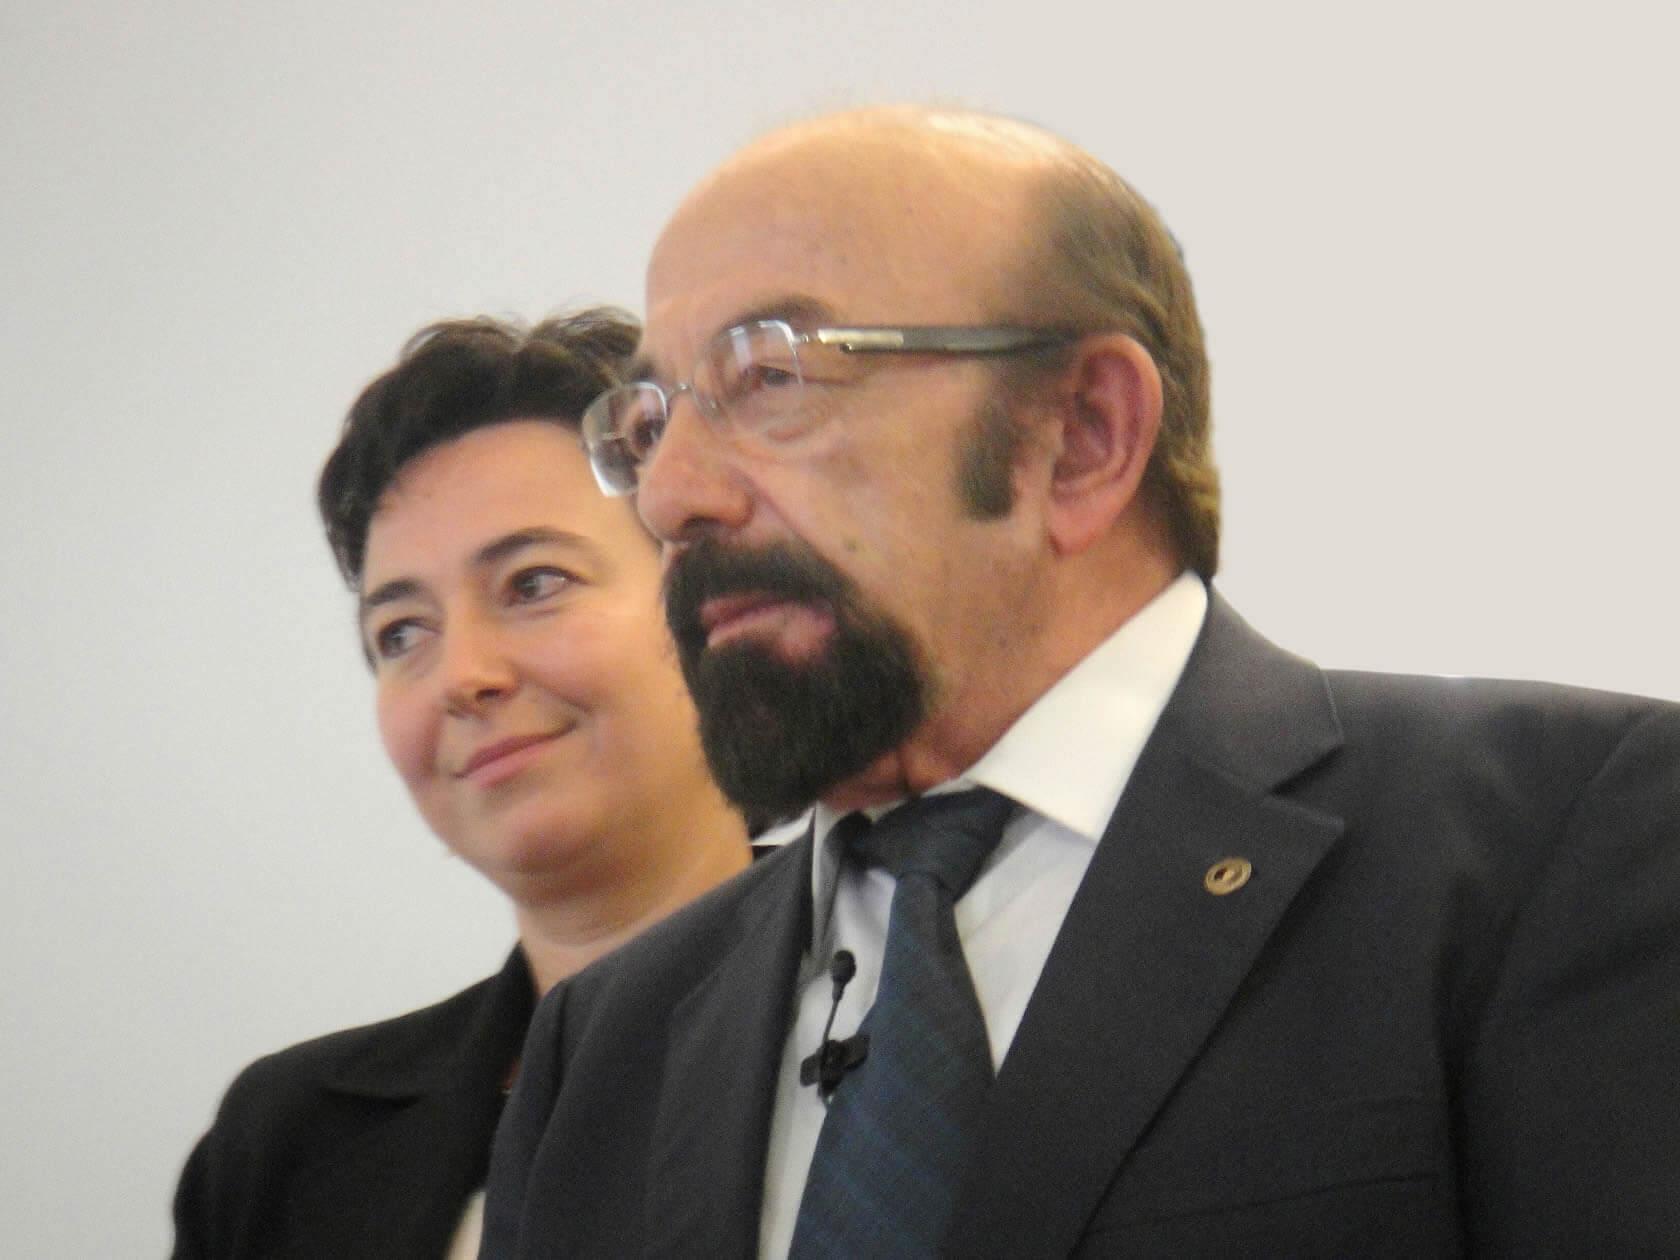 Alfonso-Nathalia-Caycedo-sophrologie-rouen-caycedienne